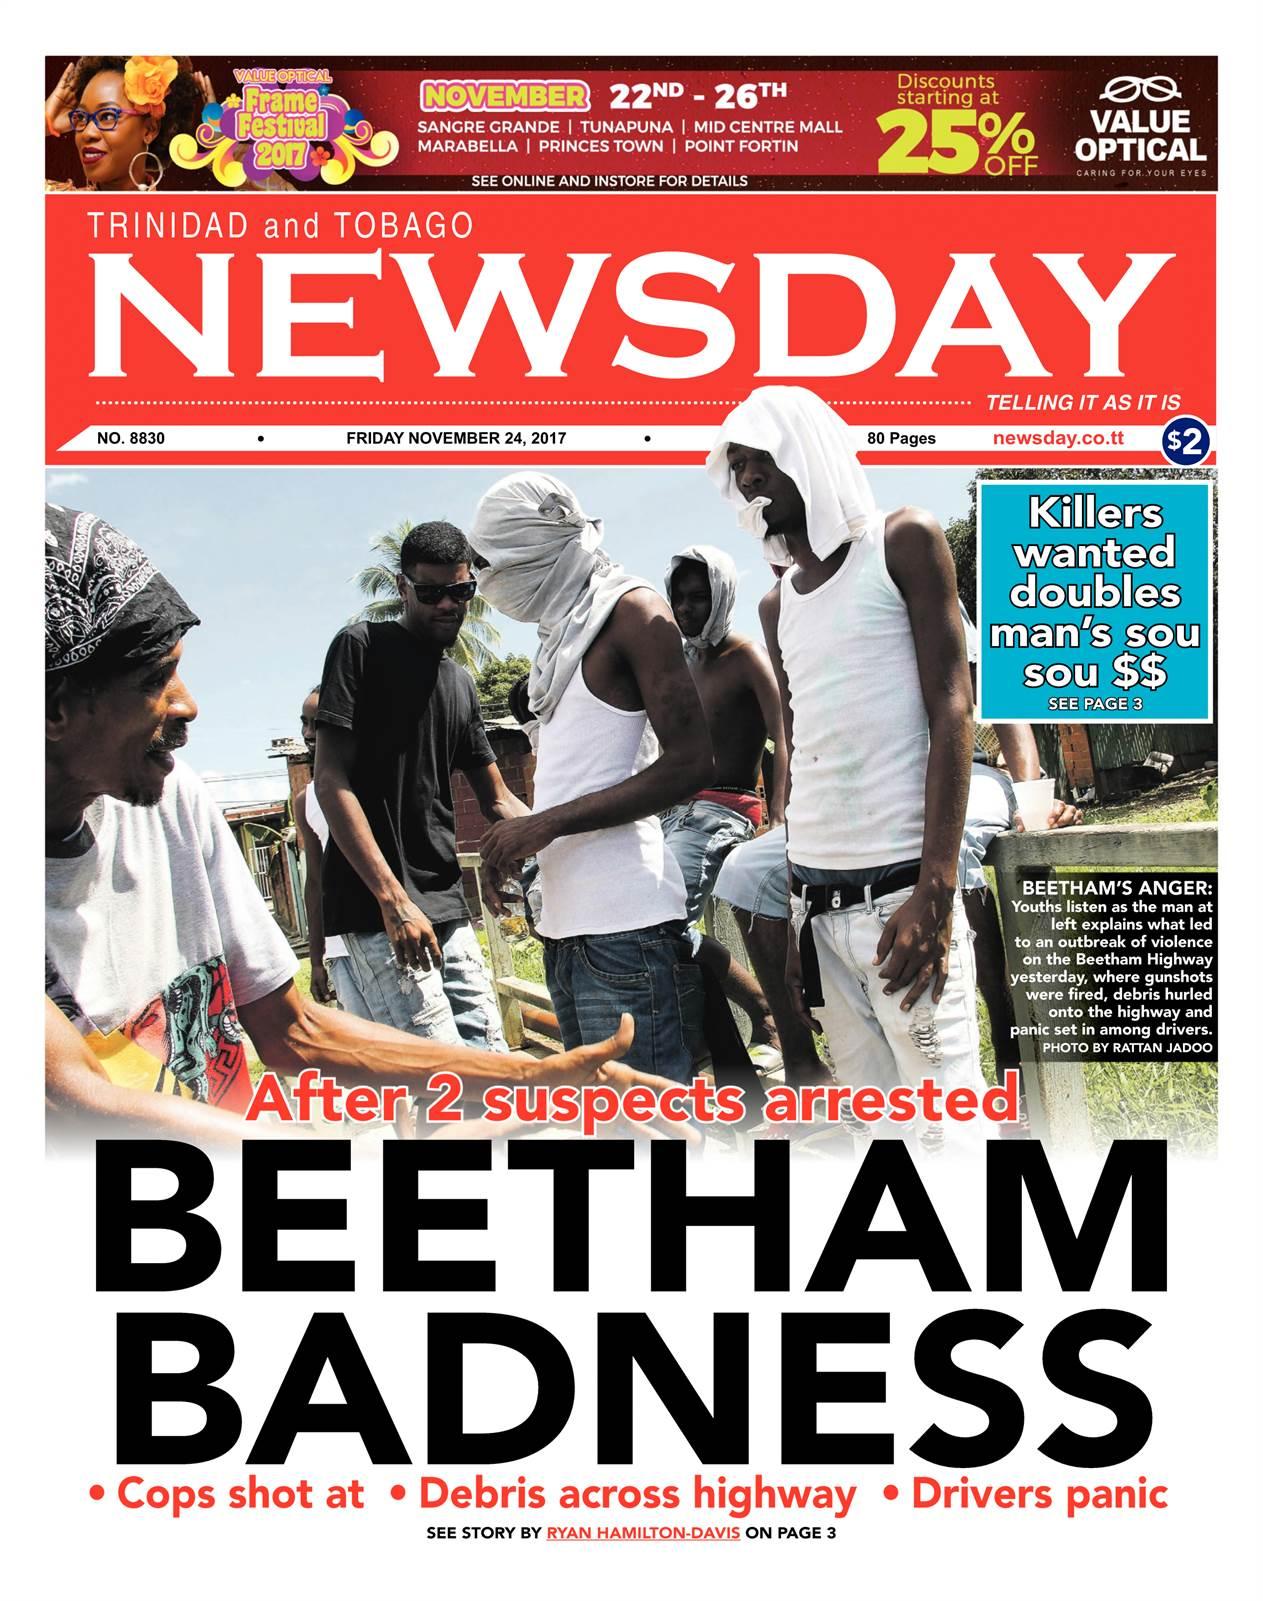 BEETHAM BADNESS